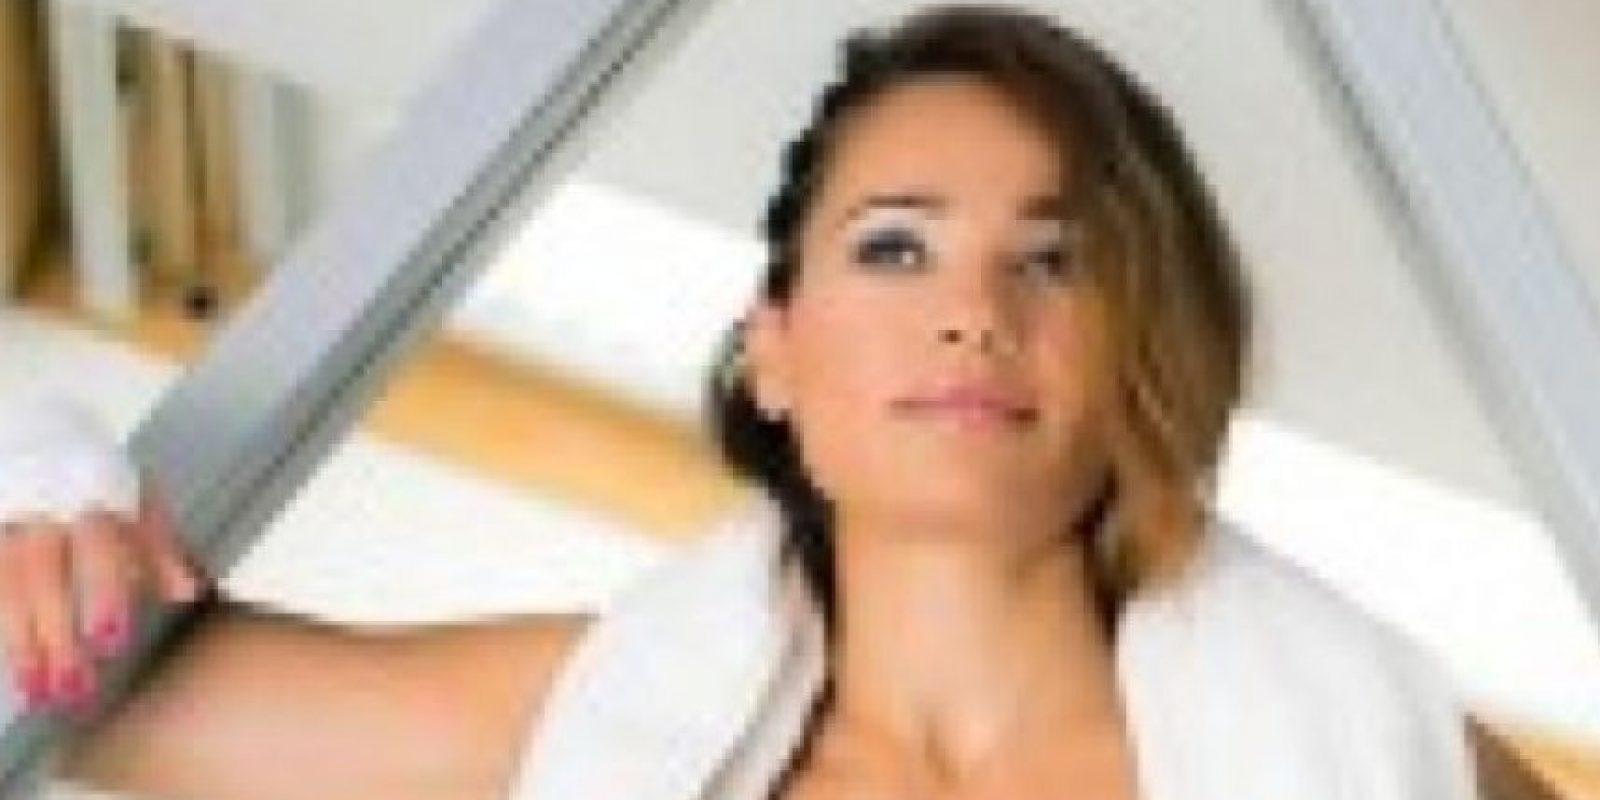 Ramouhni fue la portada de la revista Interviú del mes de septiembre. Foto:Interviú